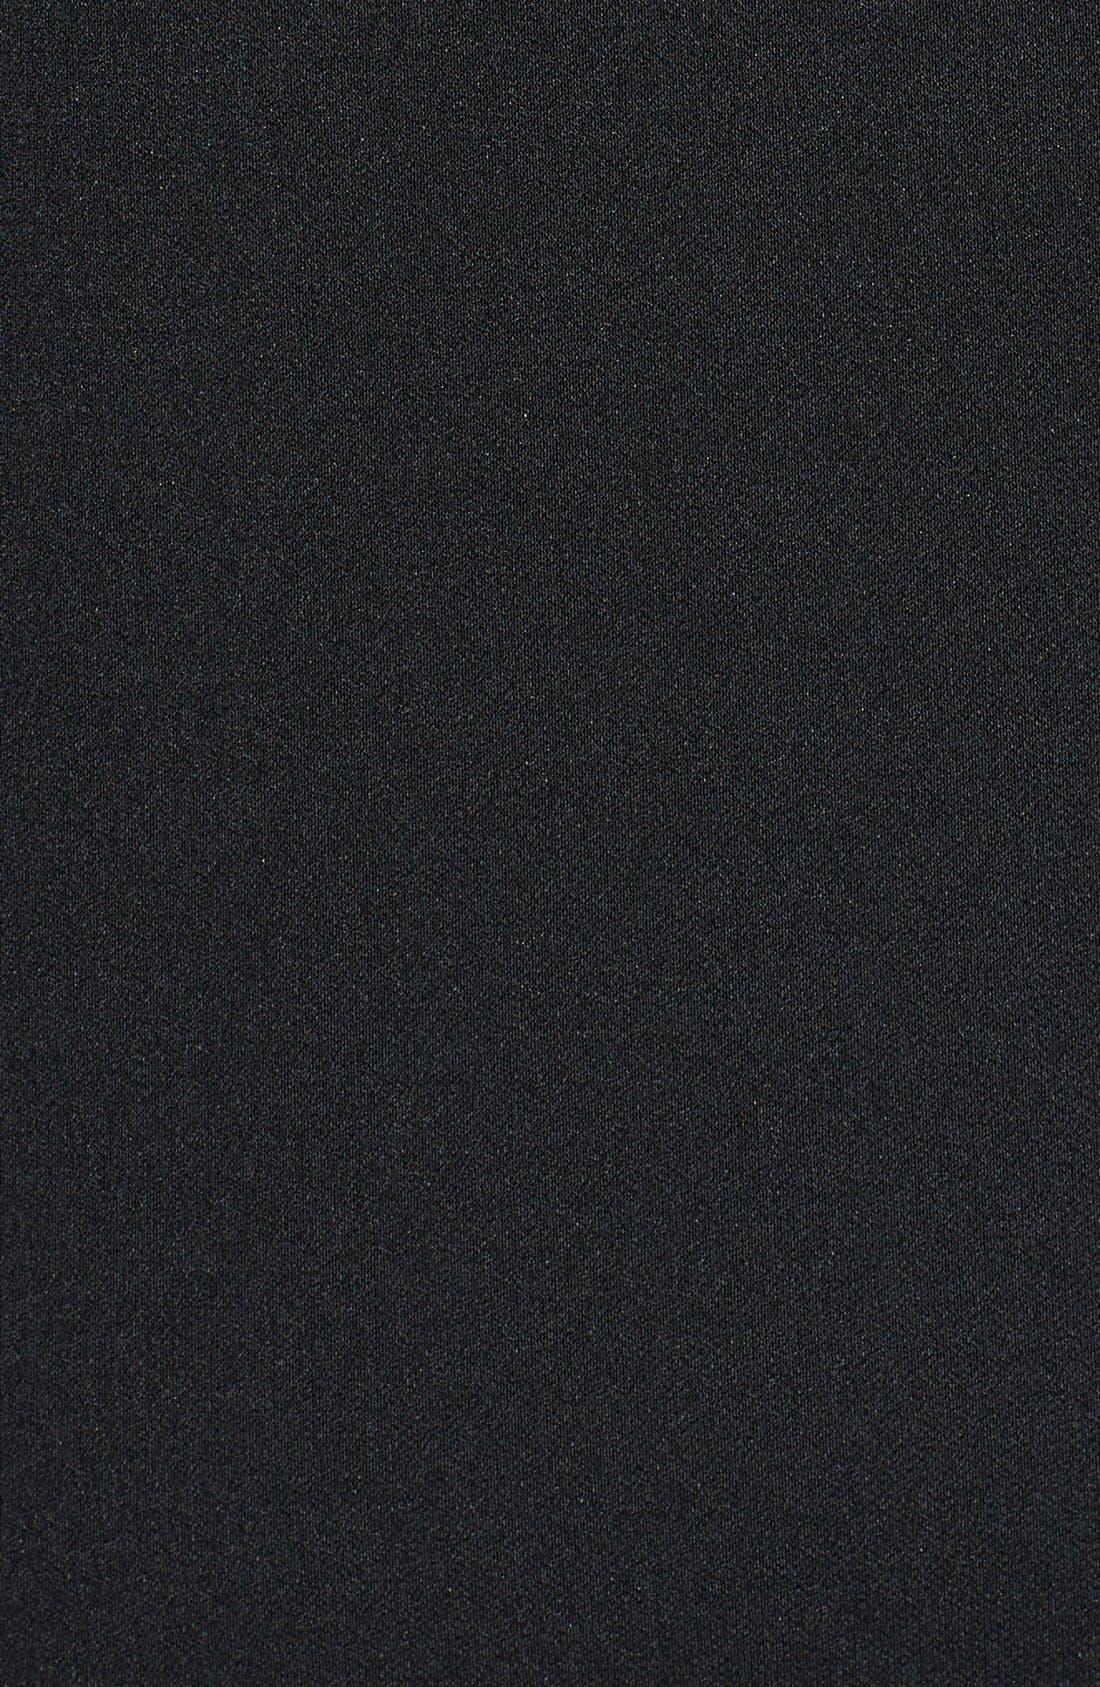 Alternate Image 3  - DKNYC Chiffon Overlay Dress (Plus Size)